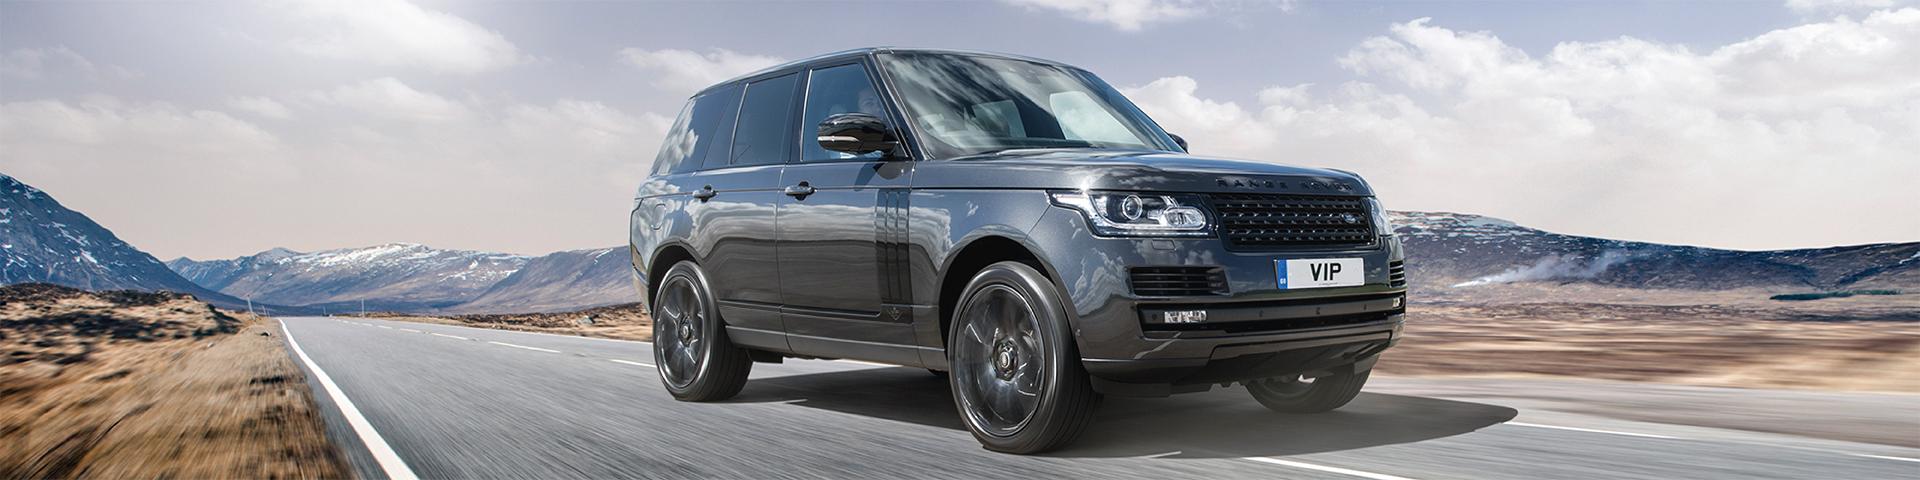 Range Rover Tuning-01-1.jpg